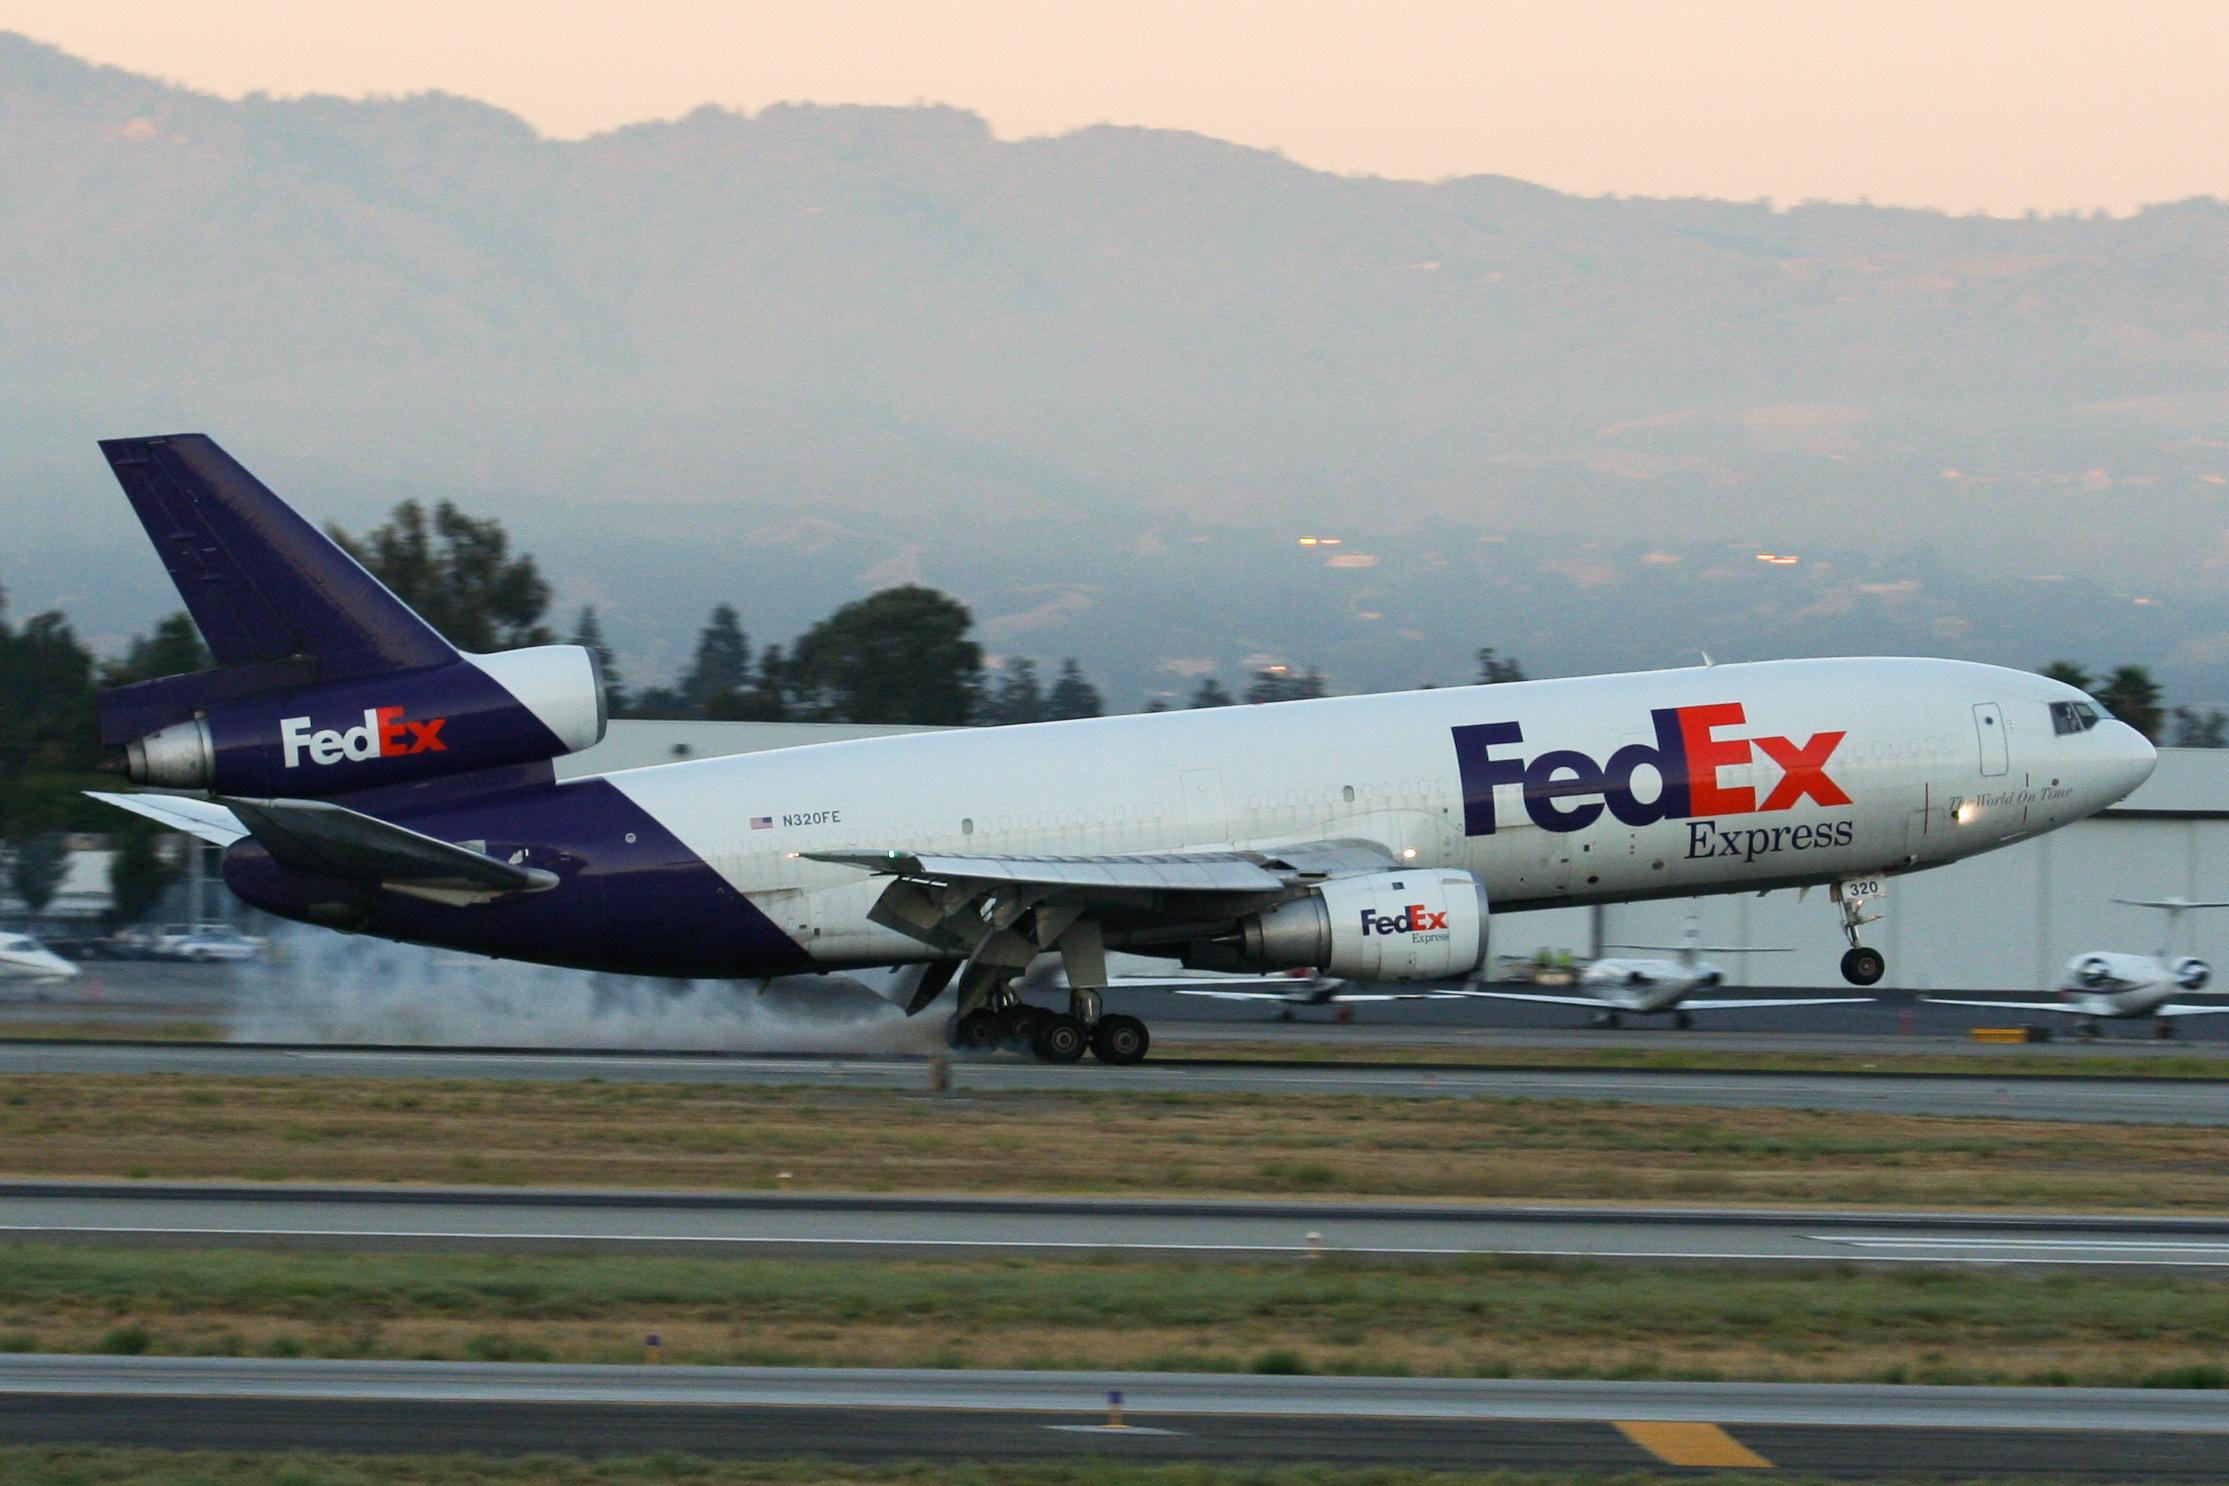 fedex express wikiwand